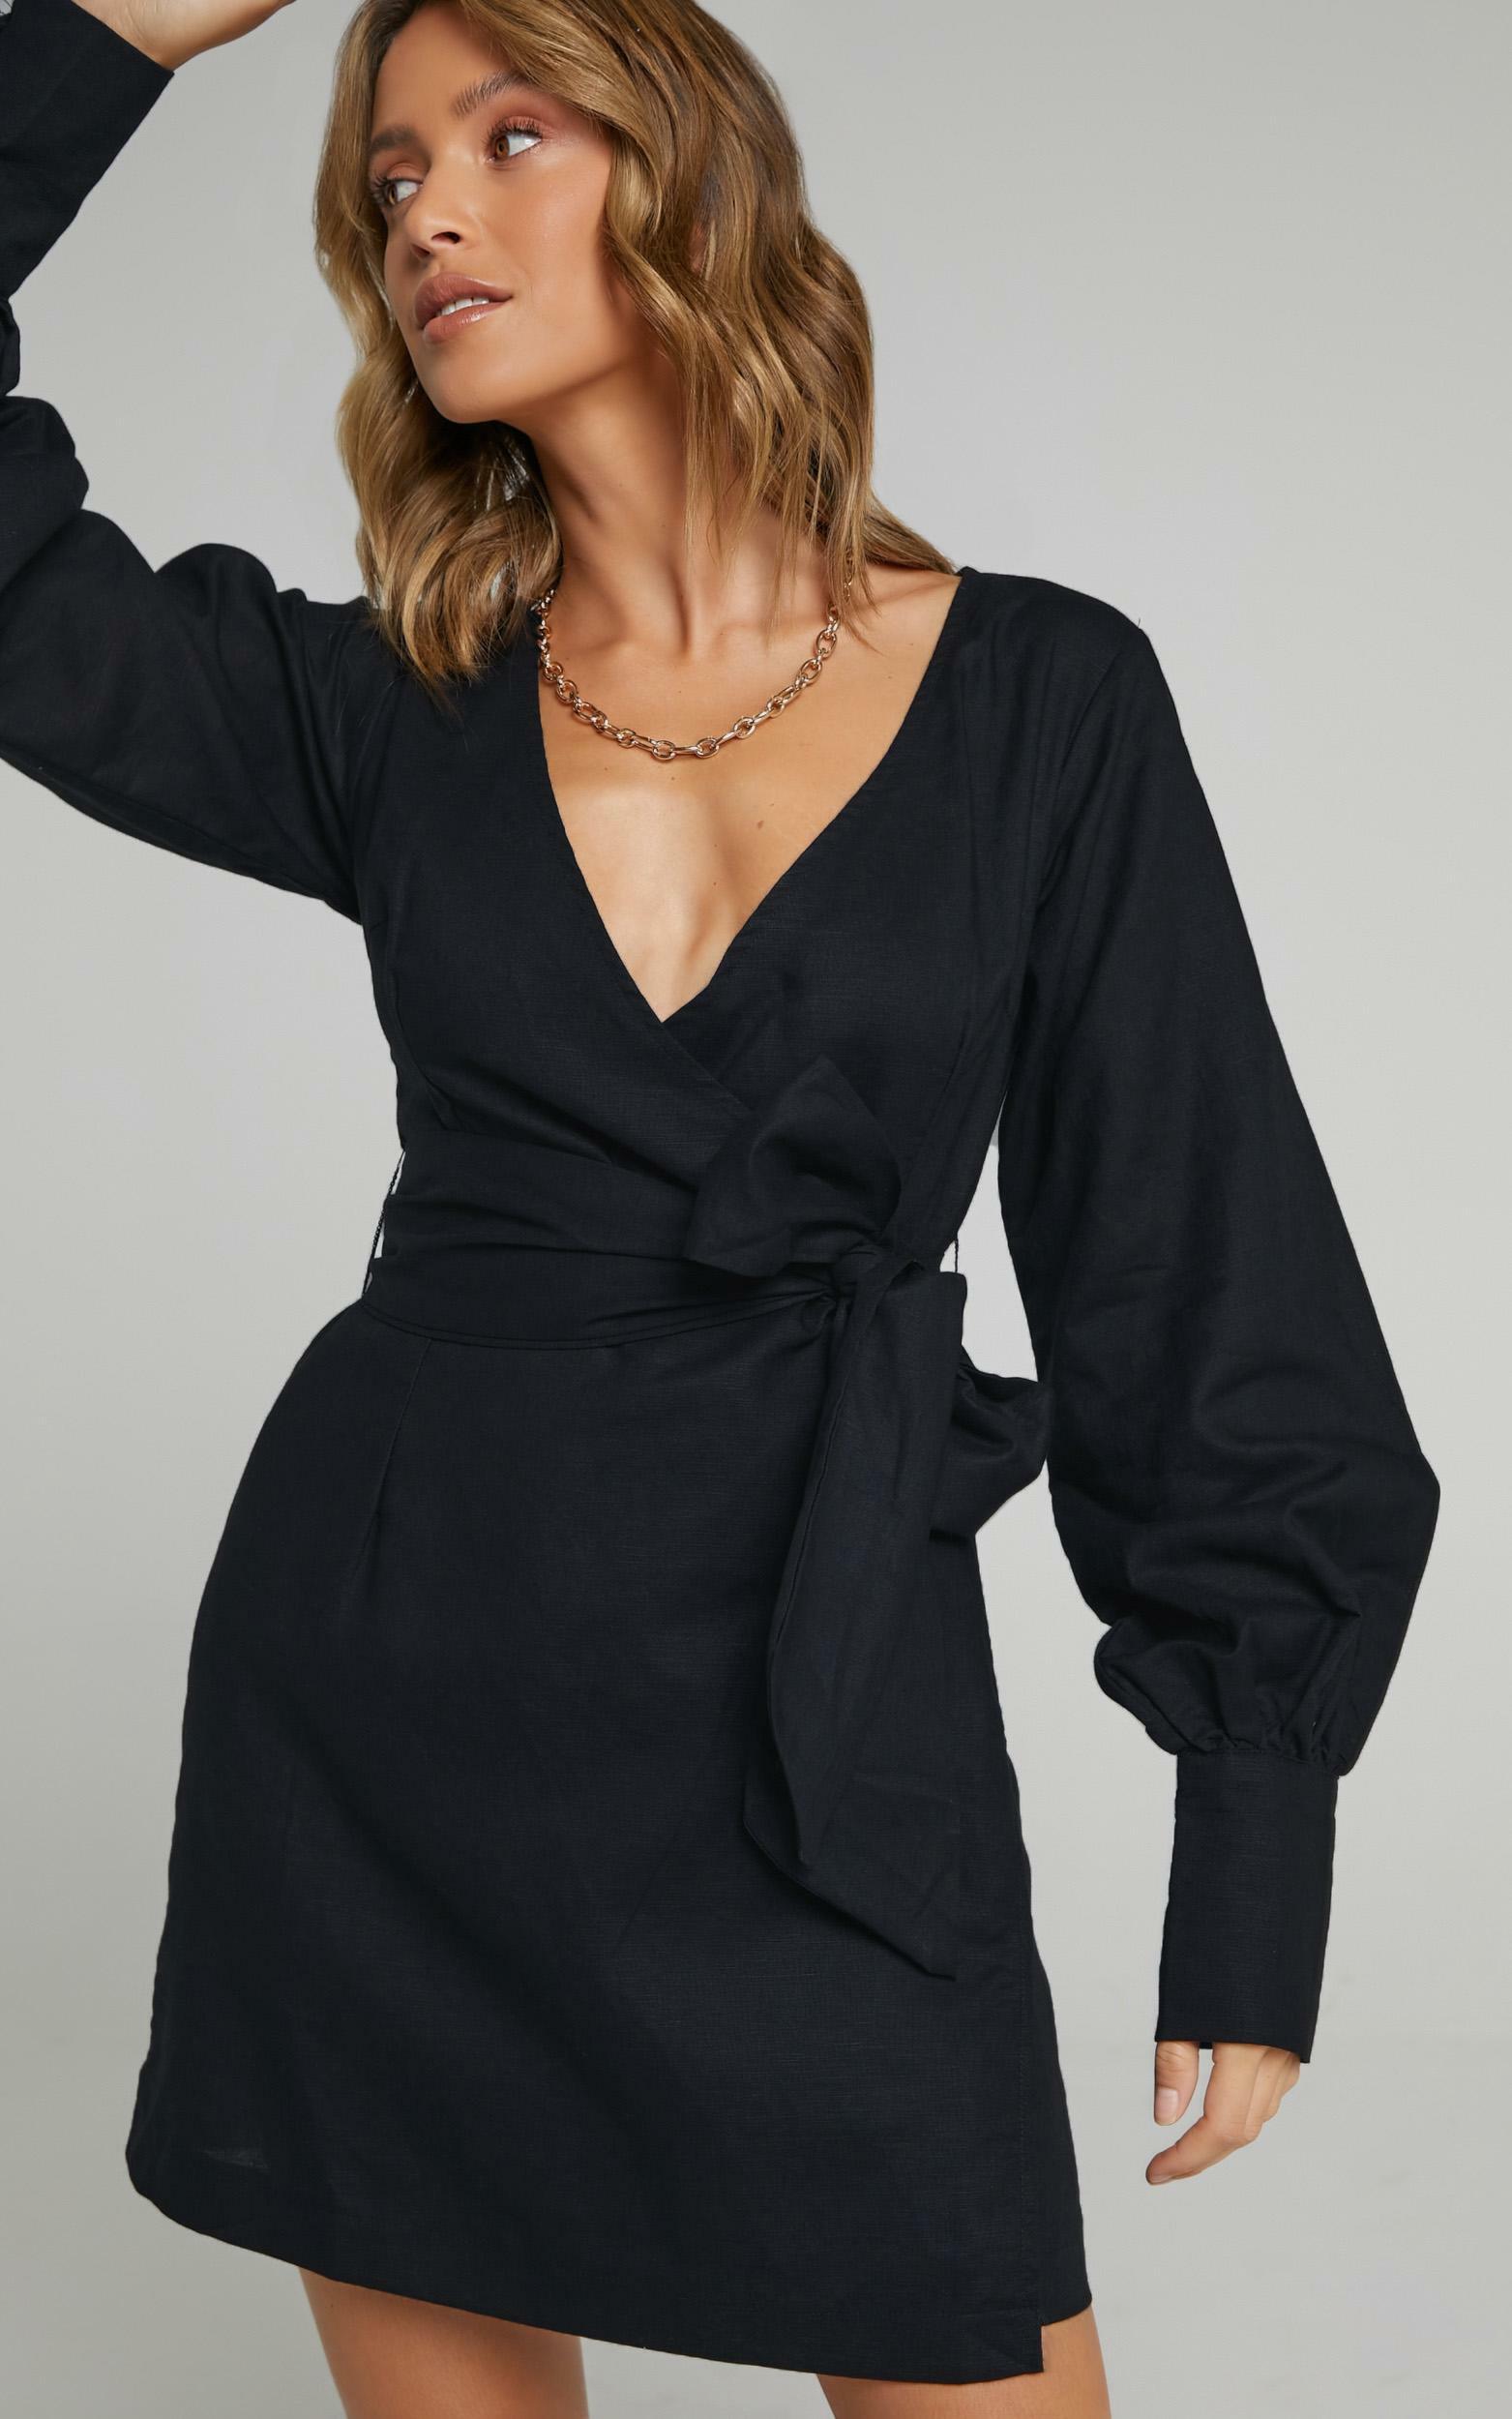 Charlie Holiday - Bella Wrap Dress in Black - XS, BLK1, hi-res image number null